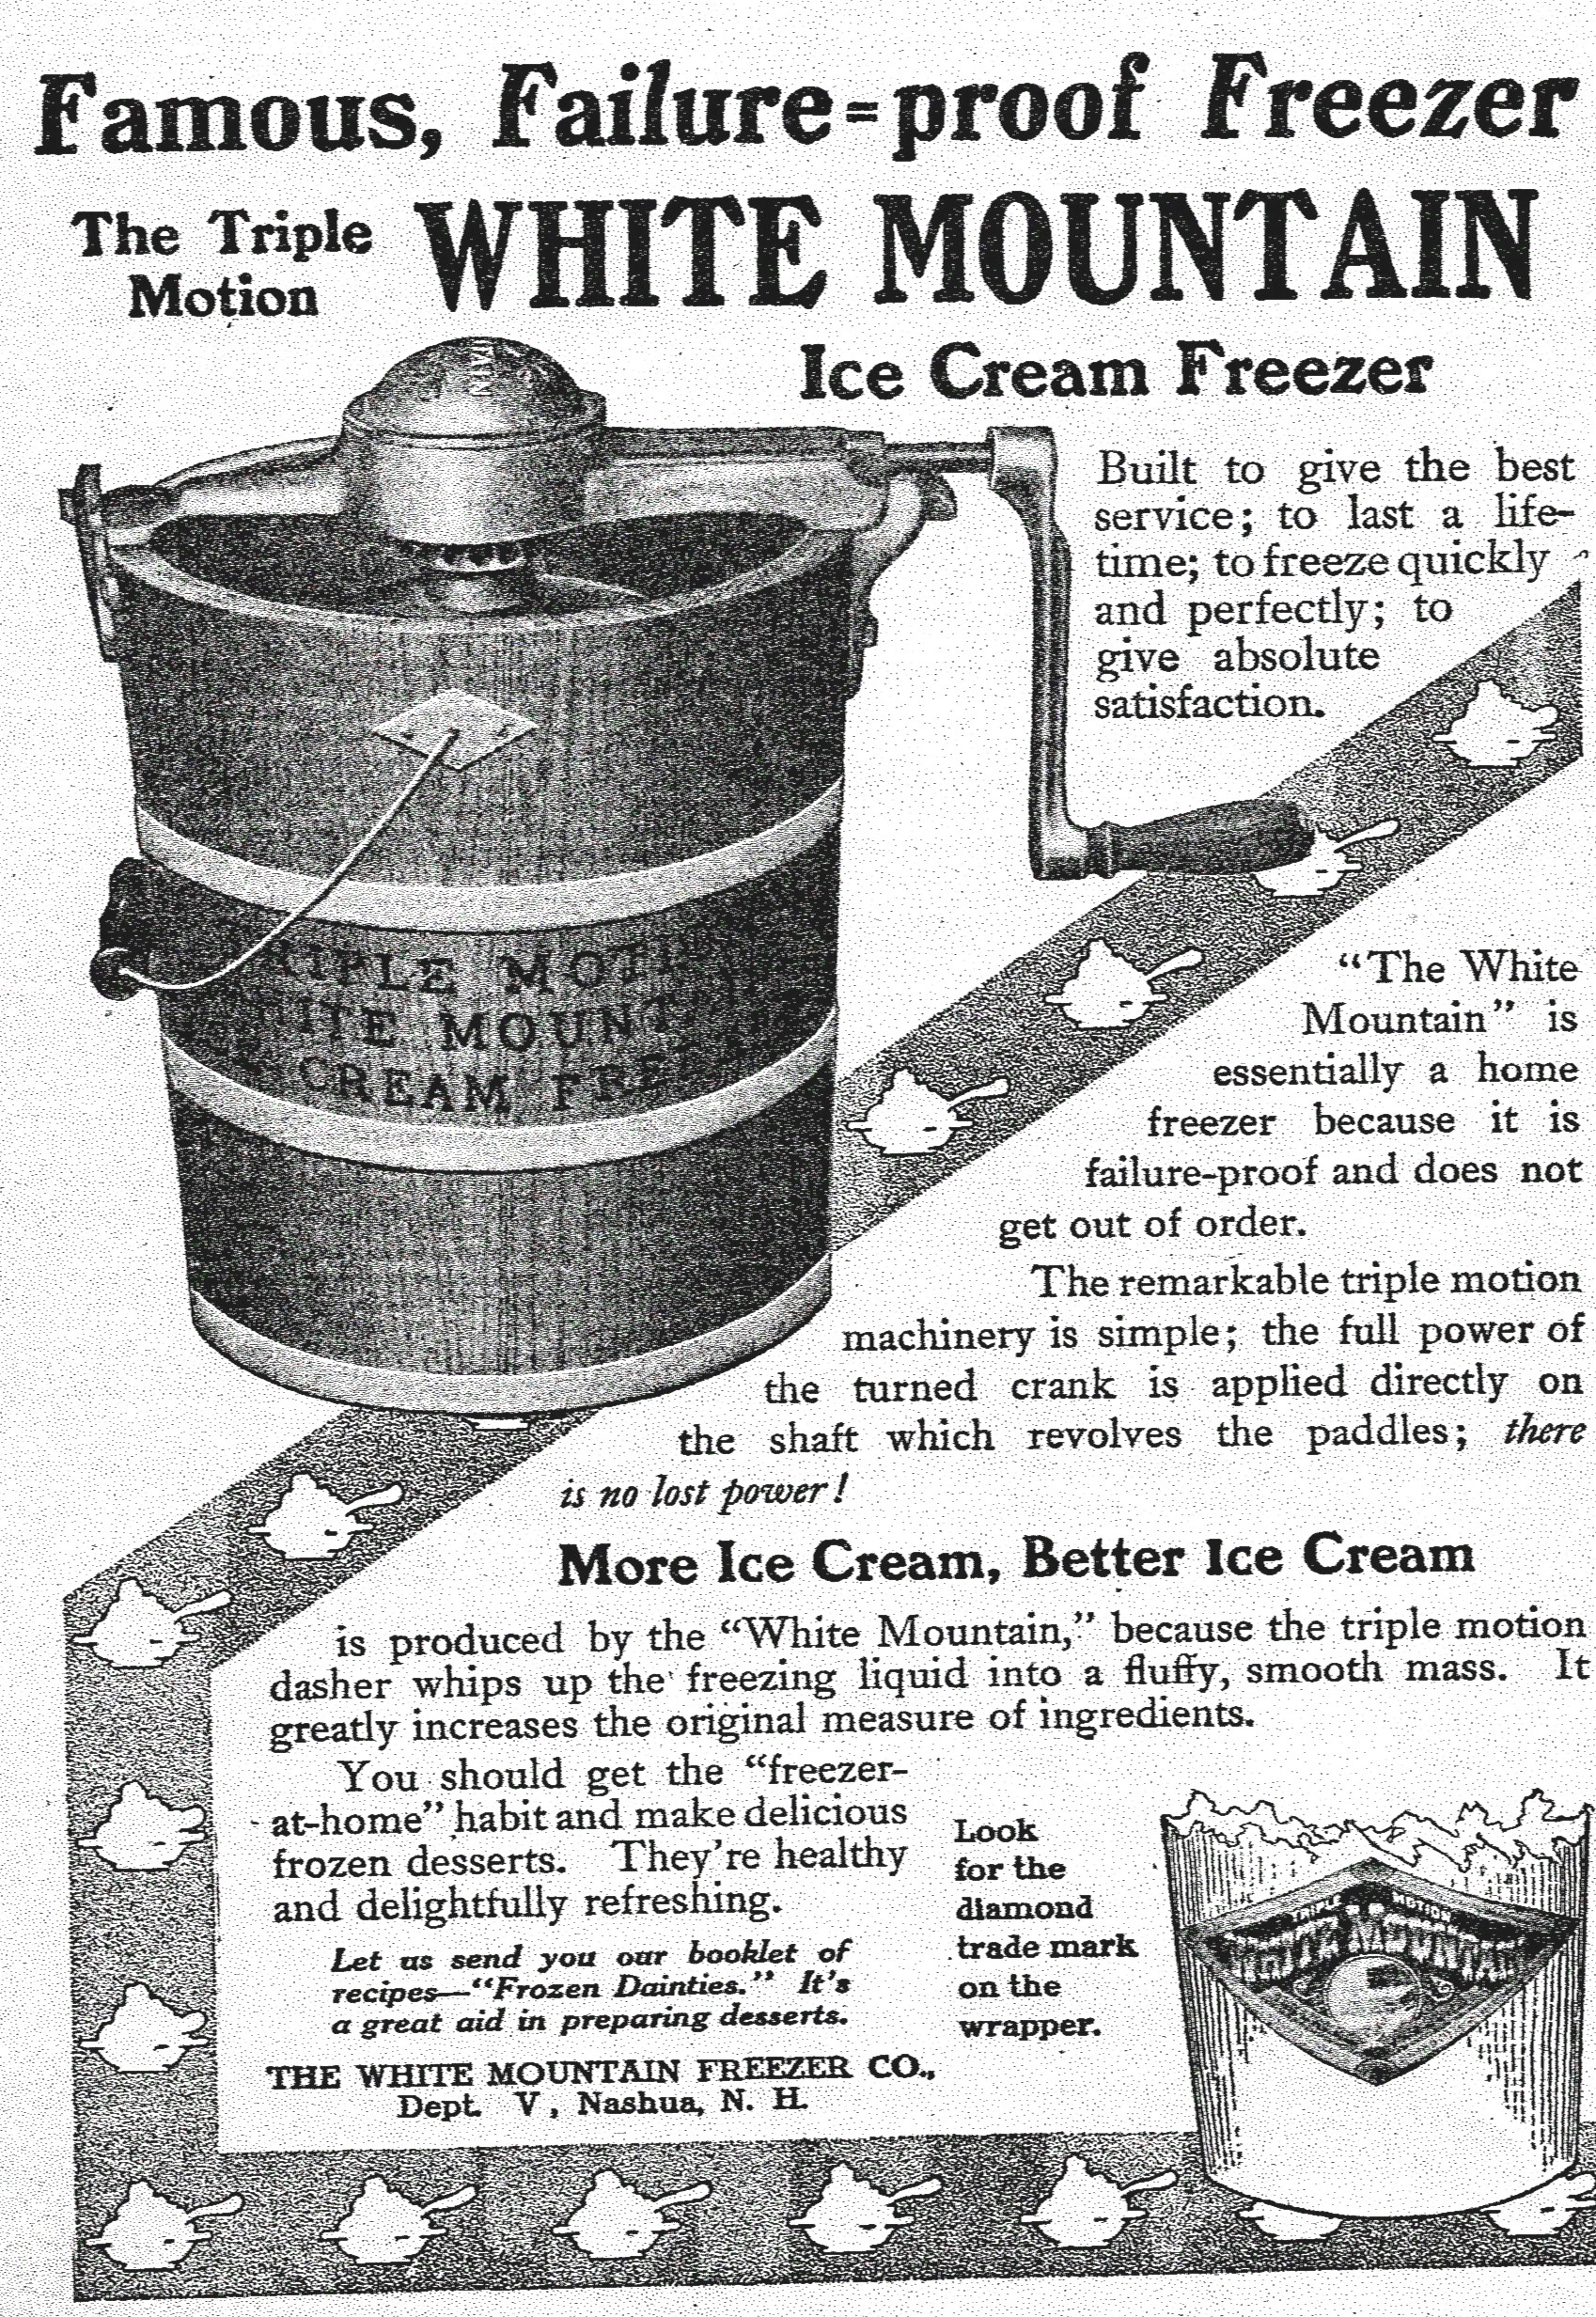 white mountain ice cream freezer advertisement a hundred years ago